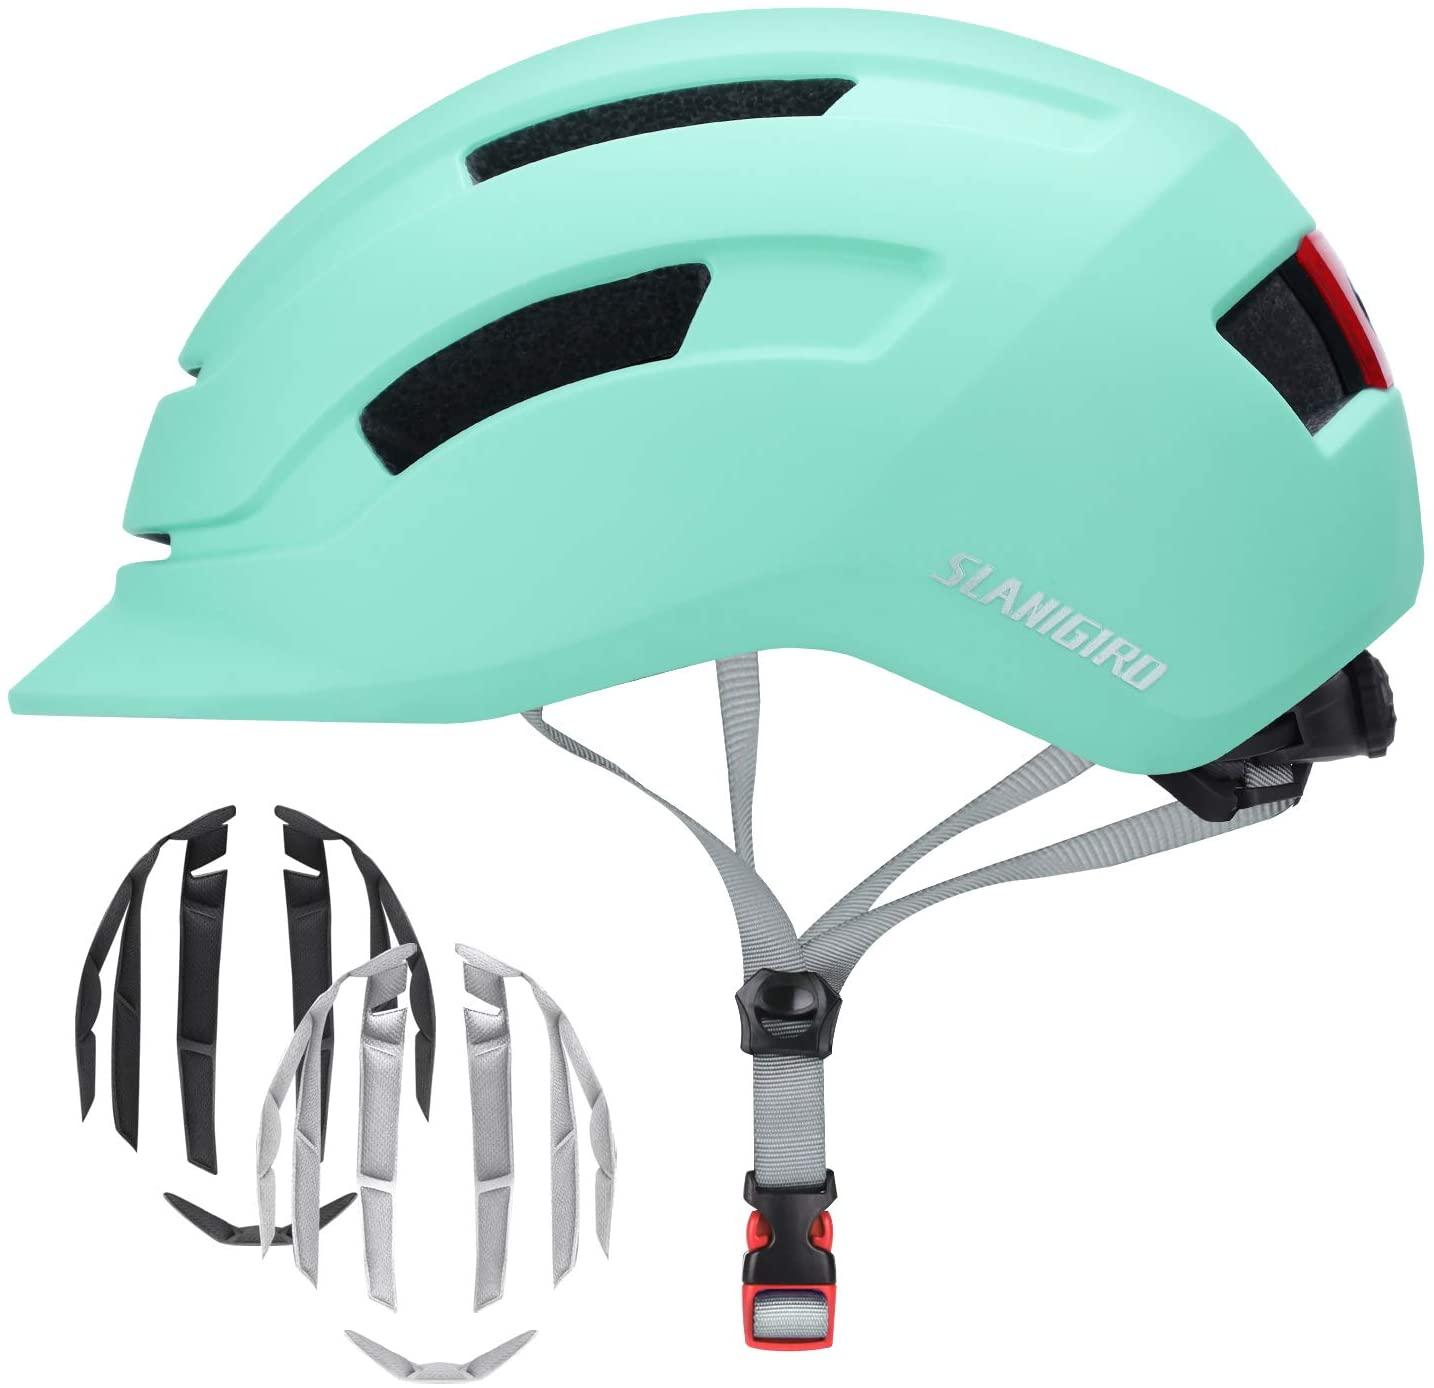 SLANIGIRO Adult-Youth Urban Bike Helmet - Adjustable Fit System & Integrated Taillight for Men Women